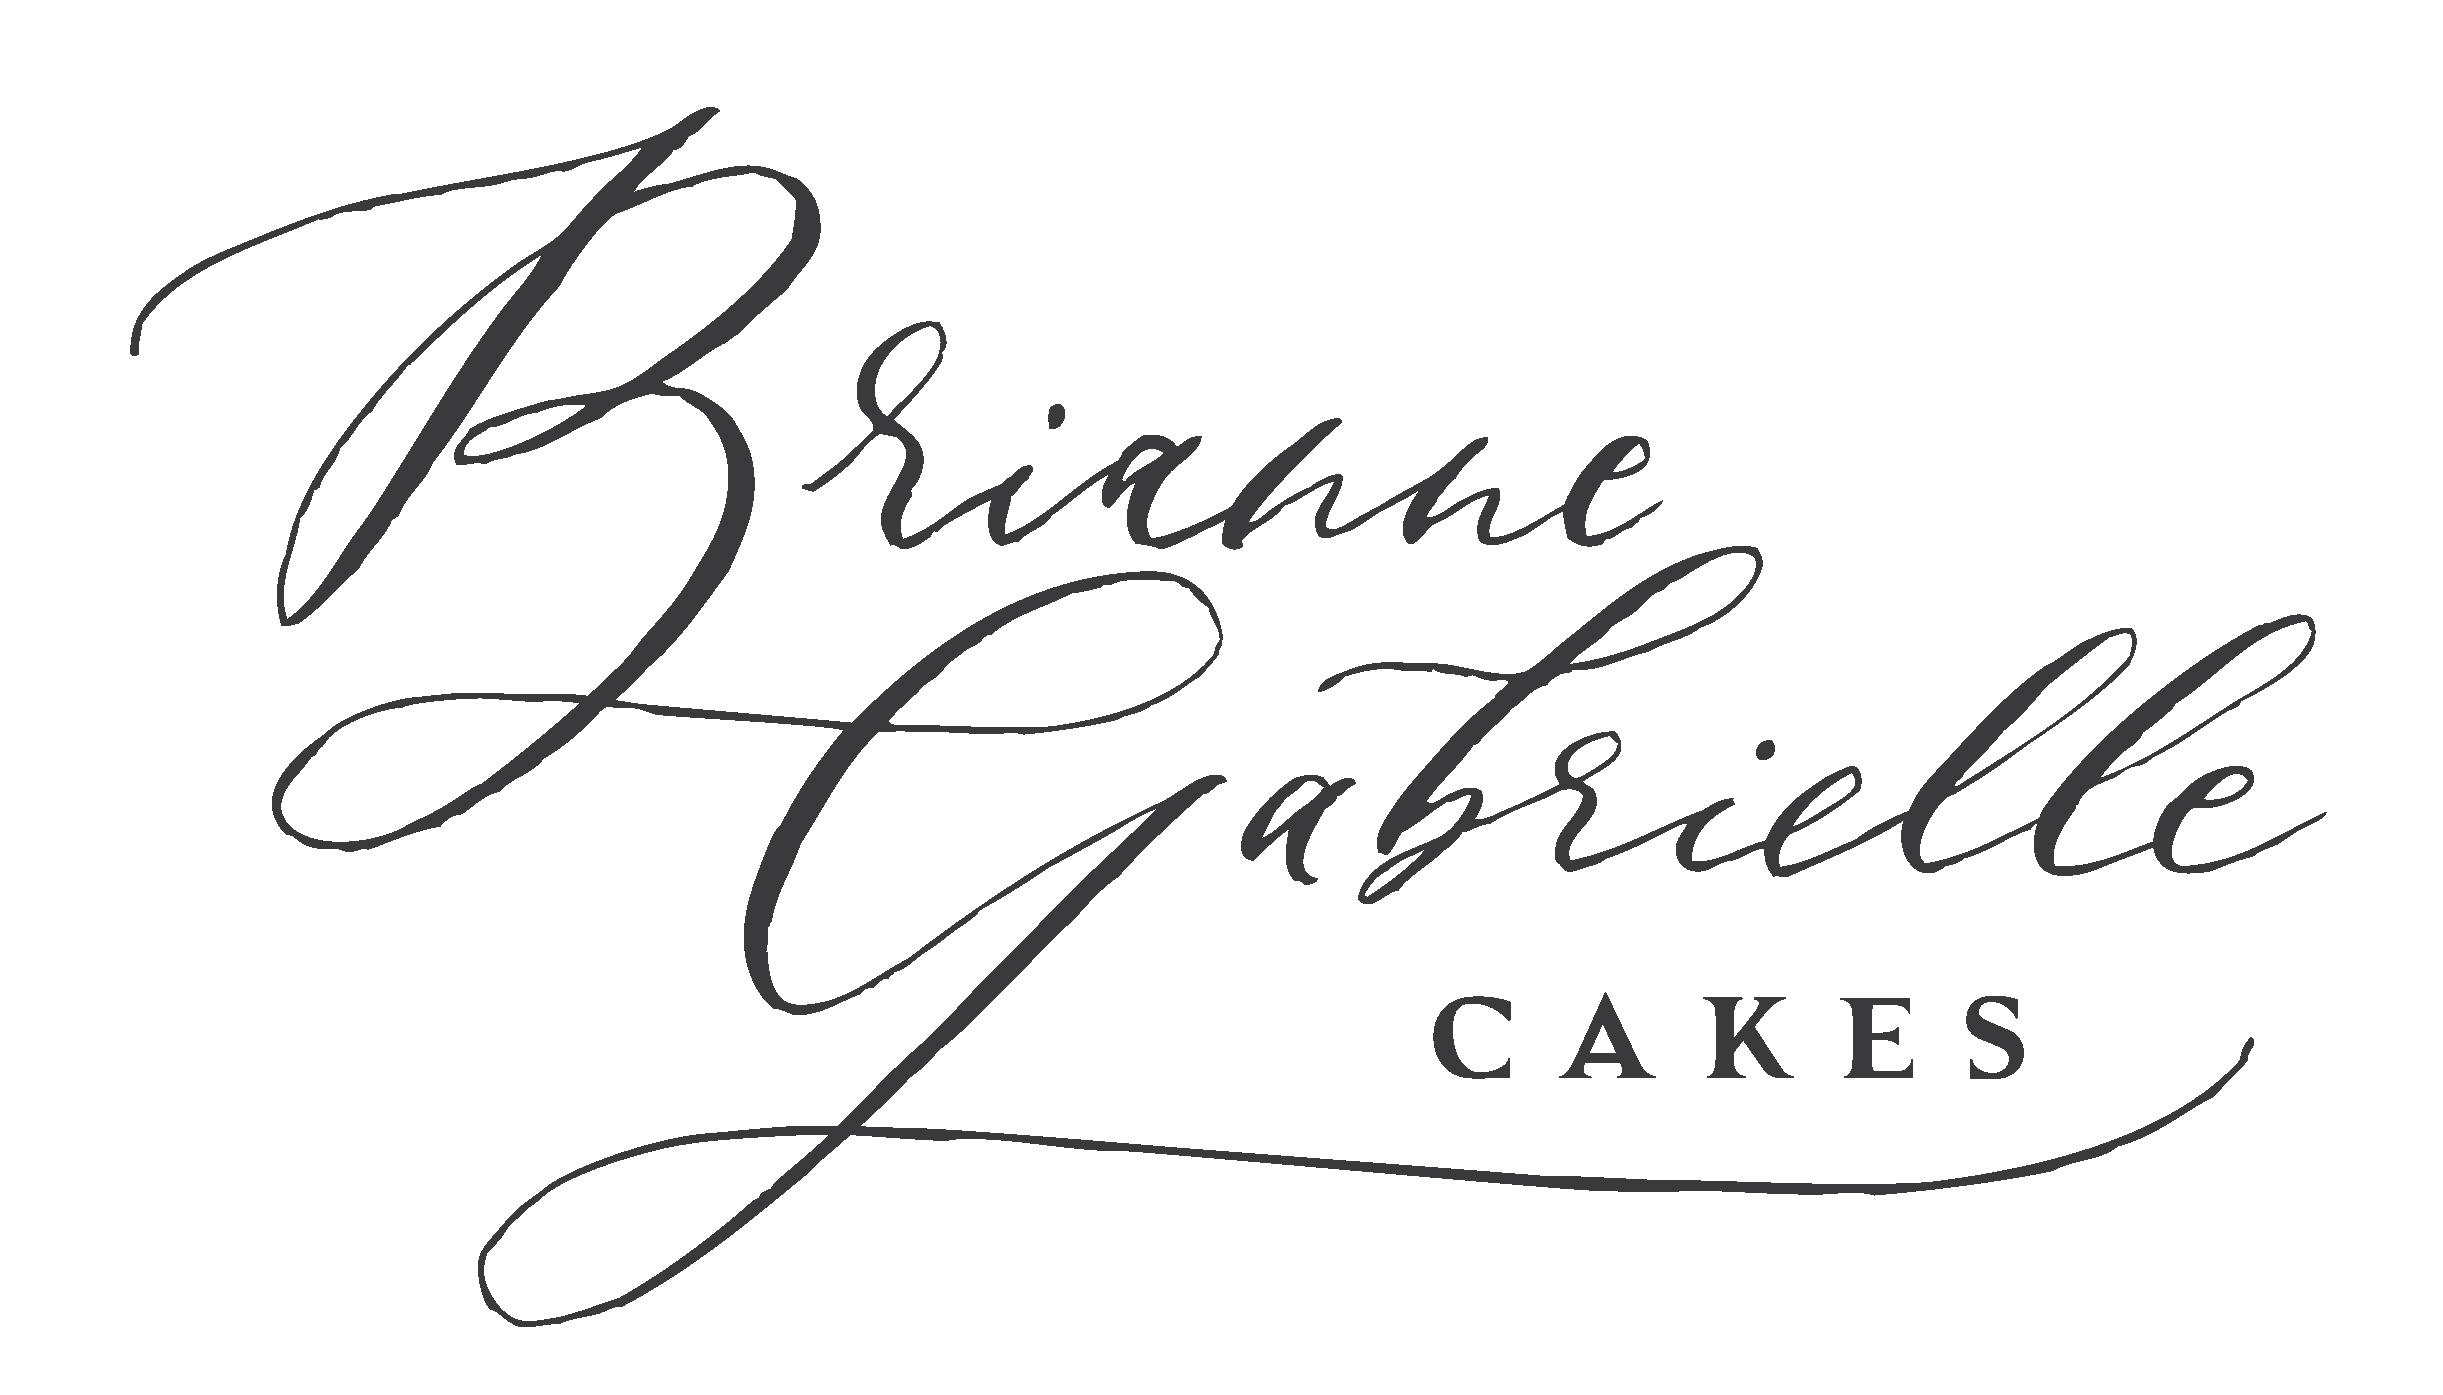 http://briannegabriellecakes.com/